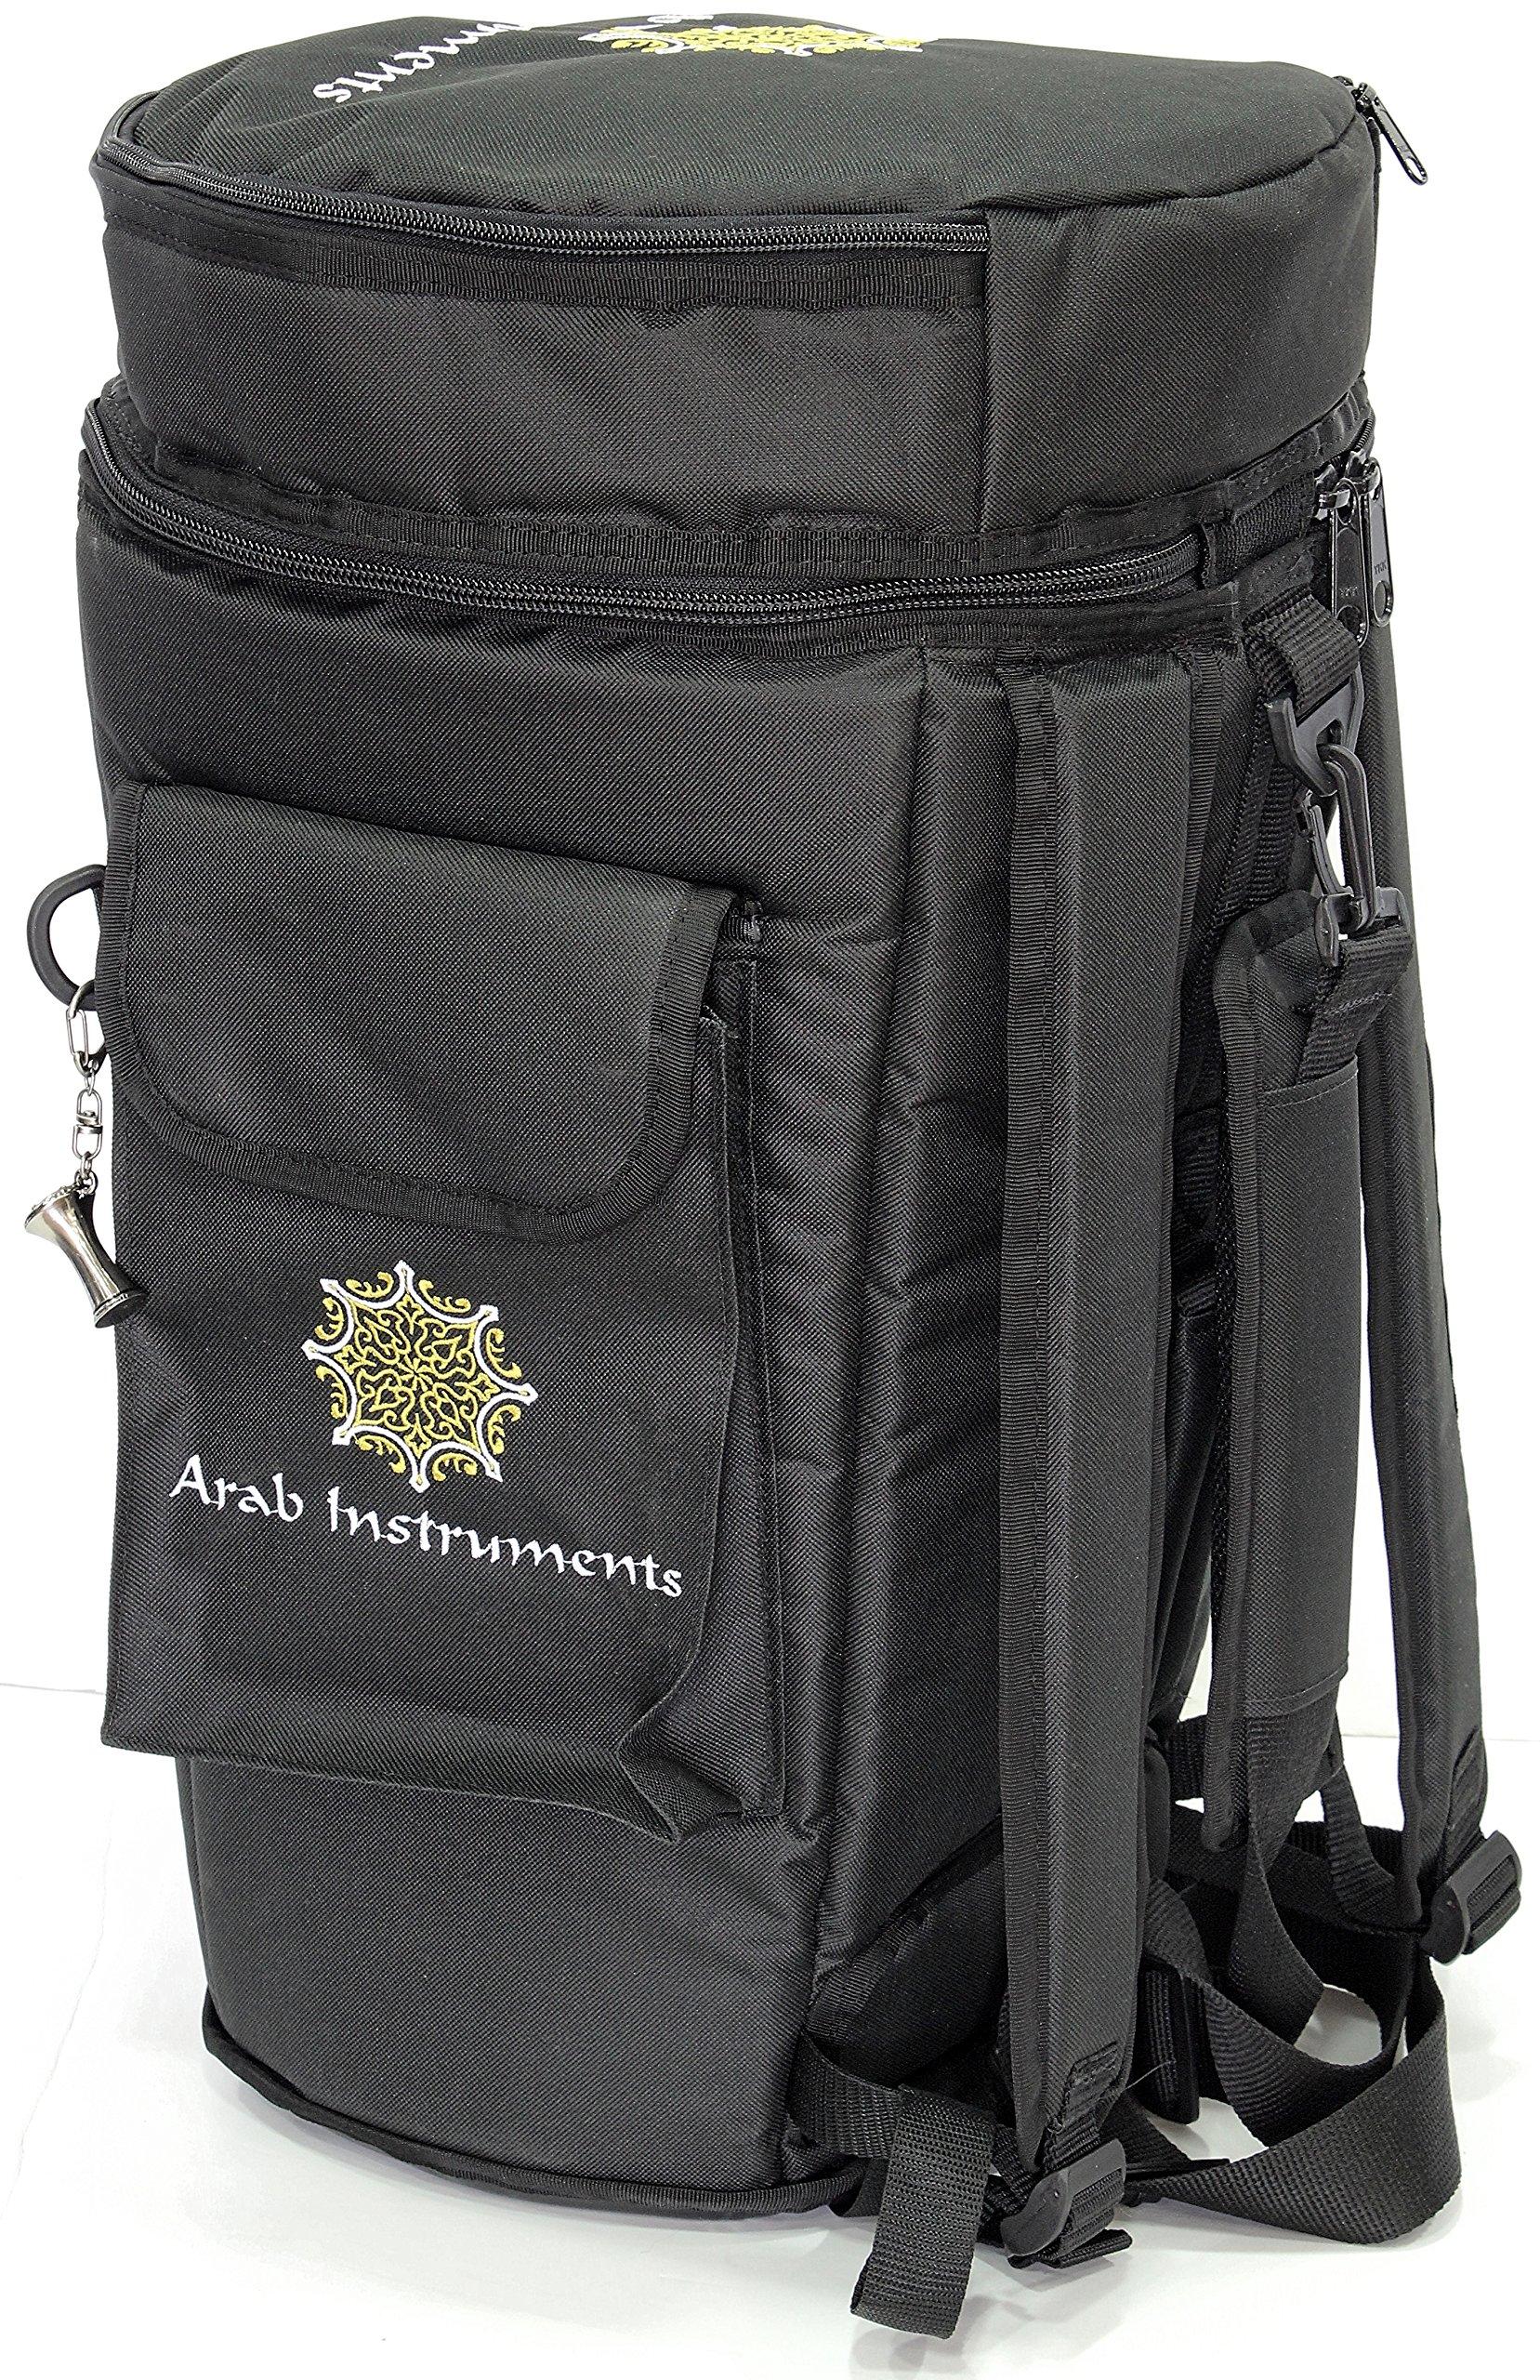 First Class Darbuka / Doumbek Case Bag - Black + Darbuka Keychain Holder